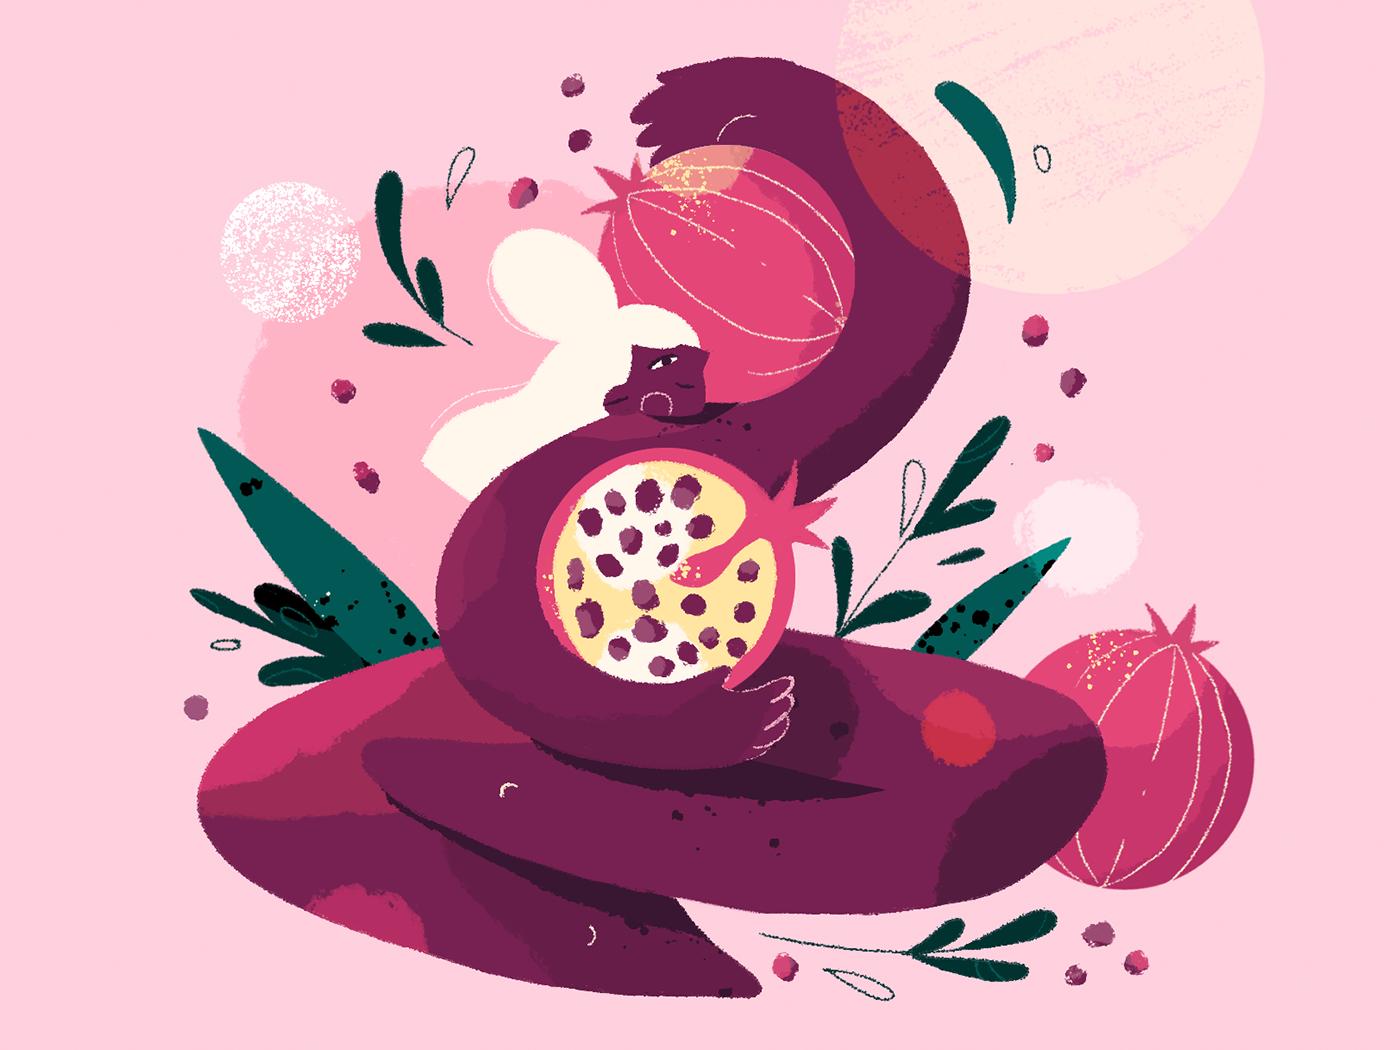 fruit ladies Fruit Lady pomegranate watermelon cherry banana Character design  photoshop ILLUSTRATION